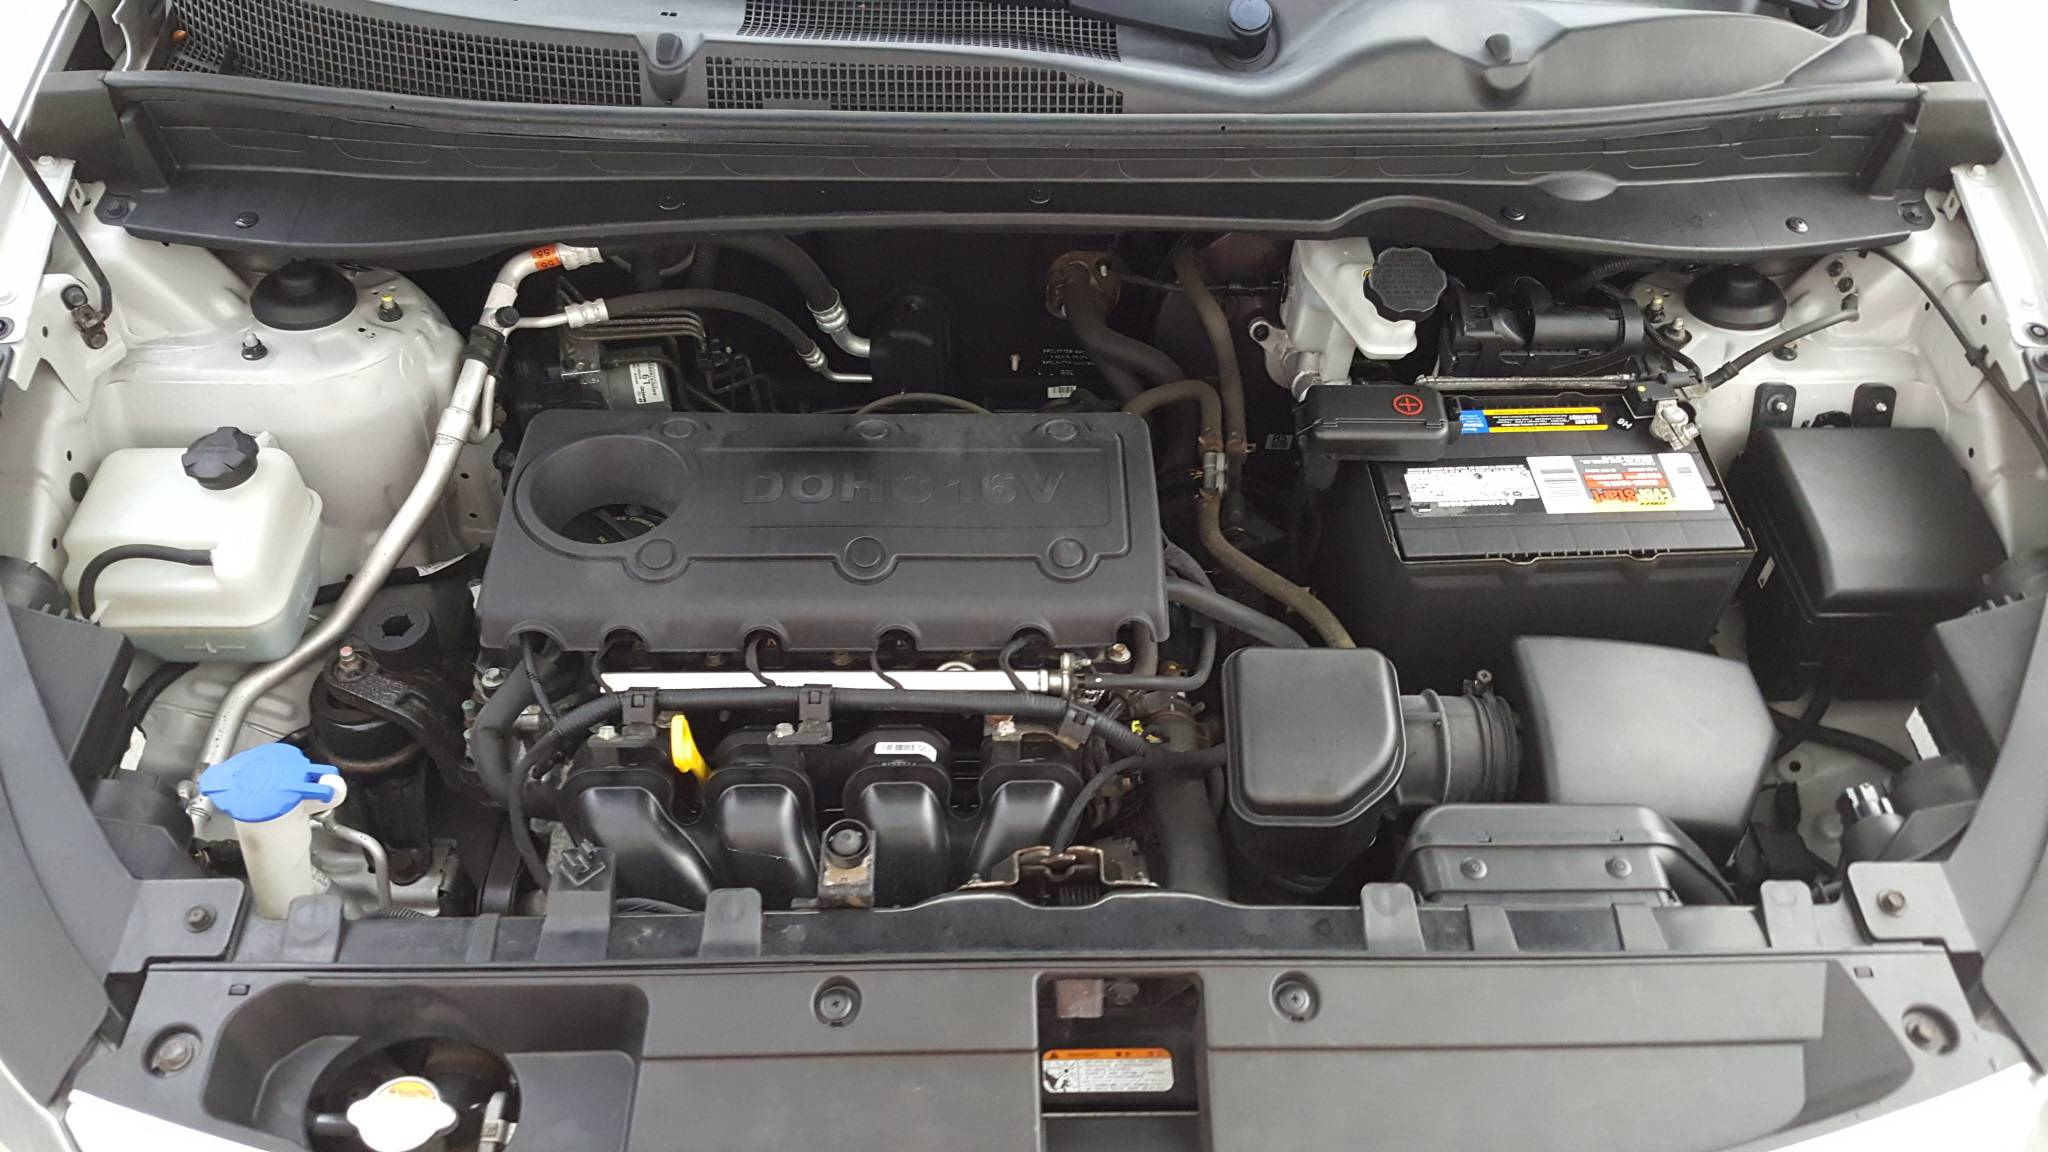 Pre-Owned 2012 Kia Sportage EX